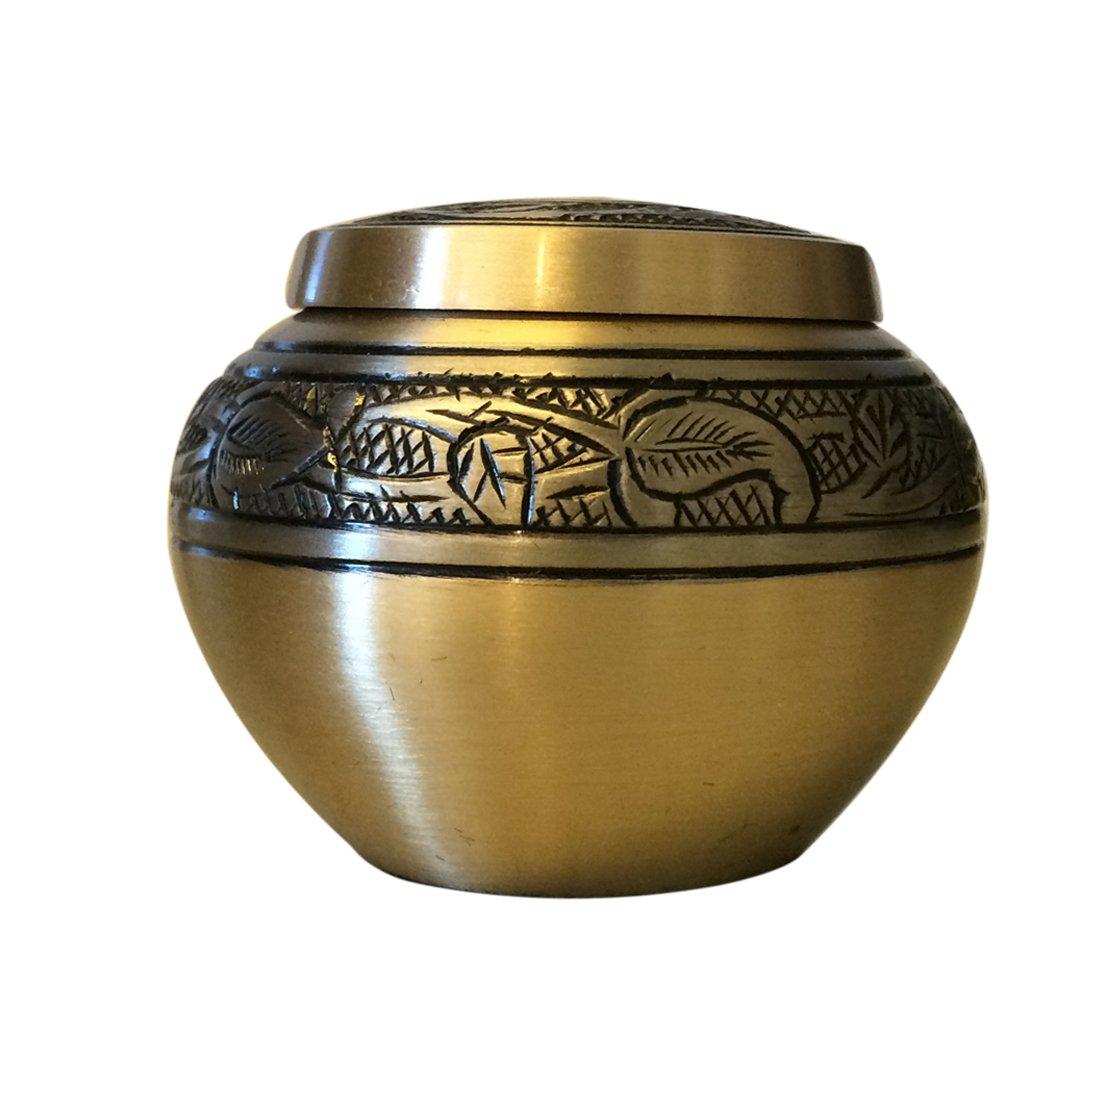 Gold Engraved Round Keepsake Urn, Mini Cremation Urns for Ashes